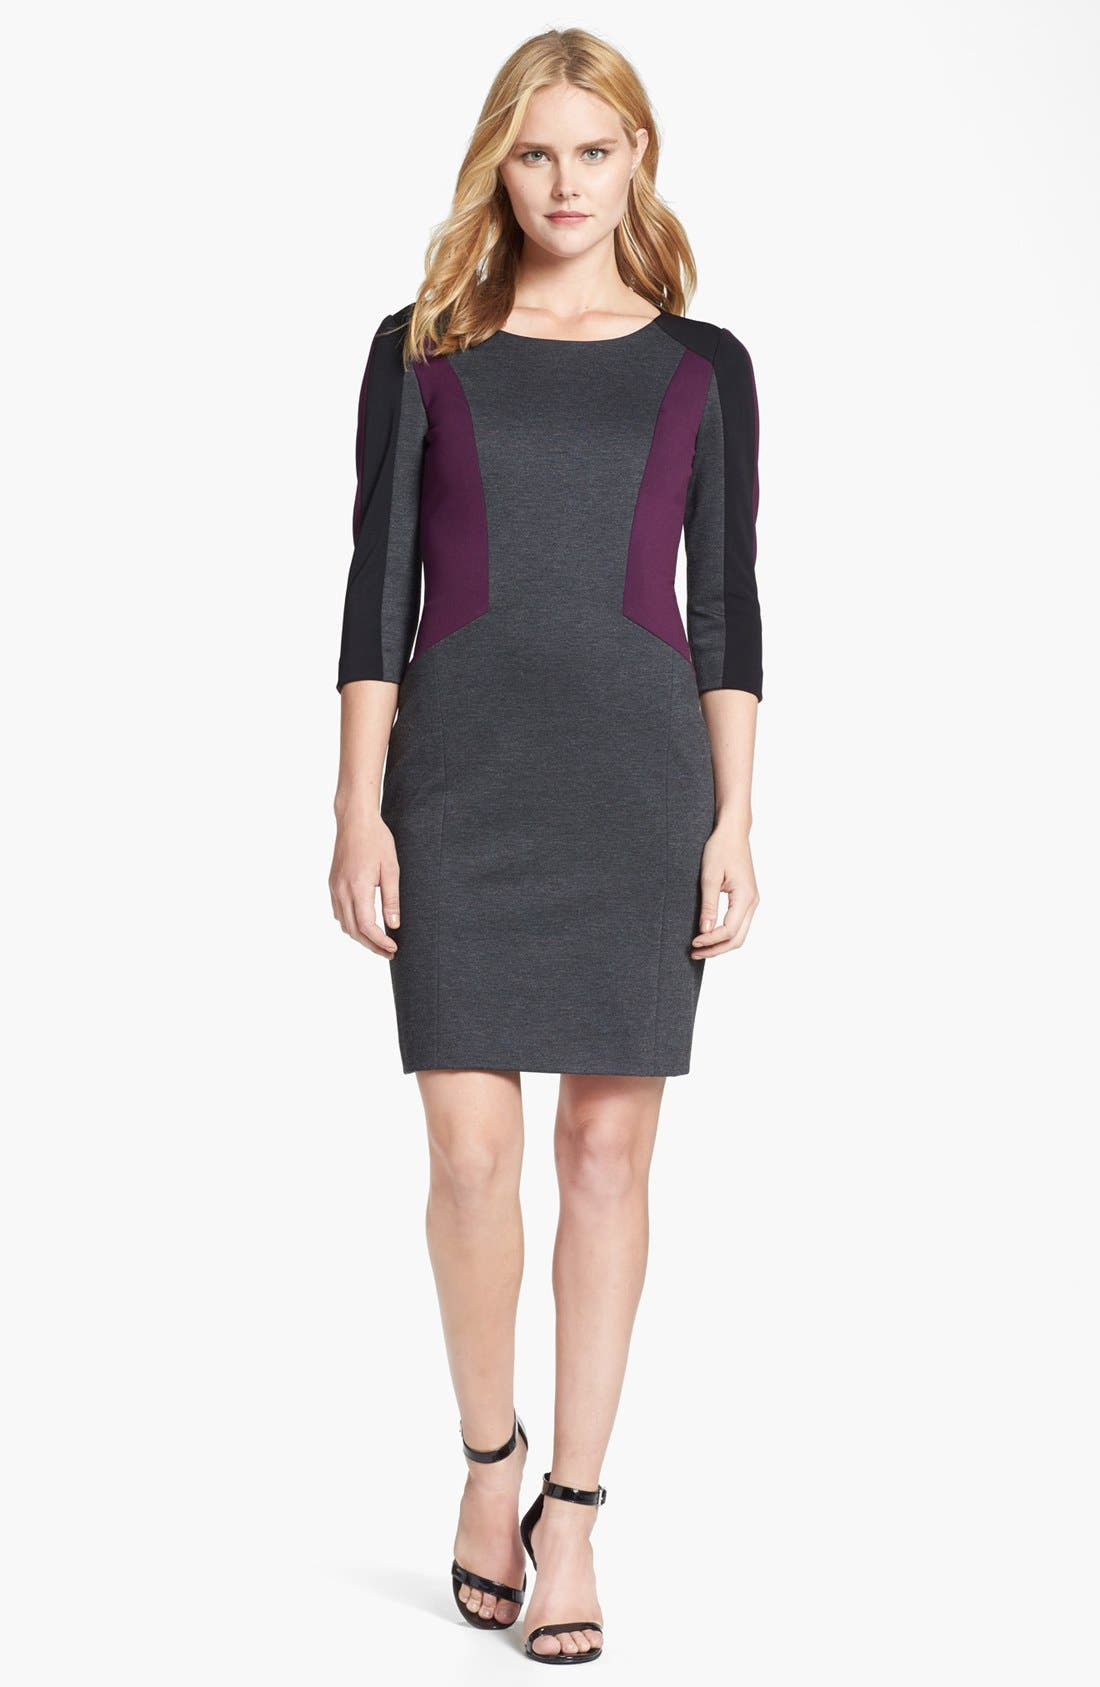 Alternate Image 1 Selected - Tahari Colorblock Sheath Dress